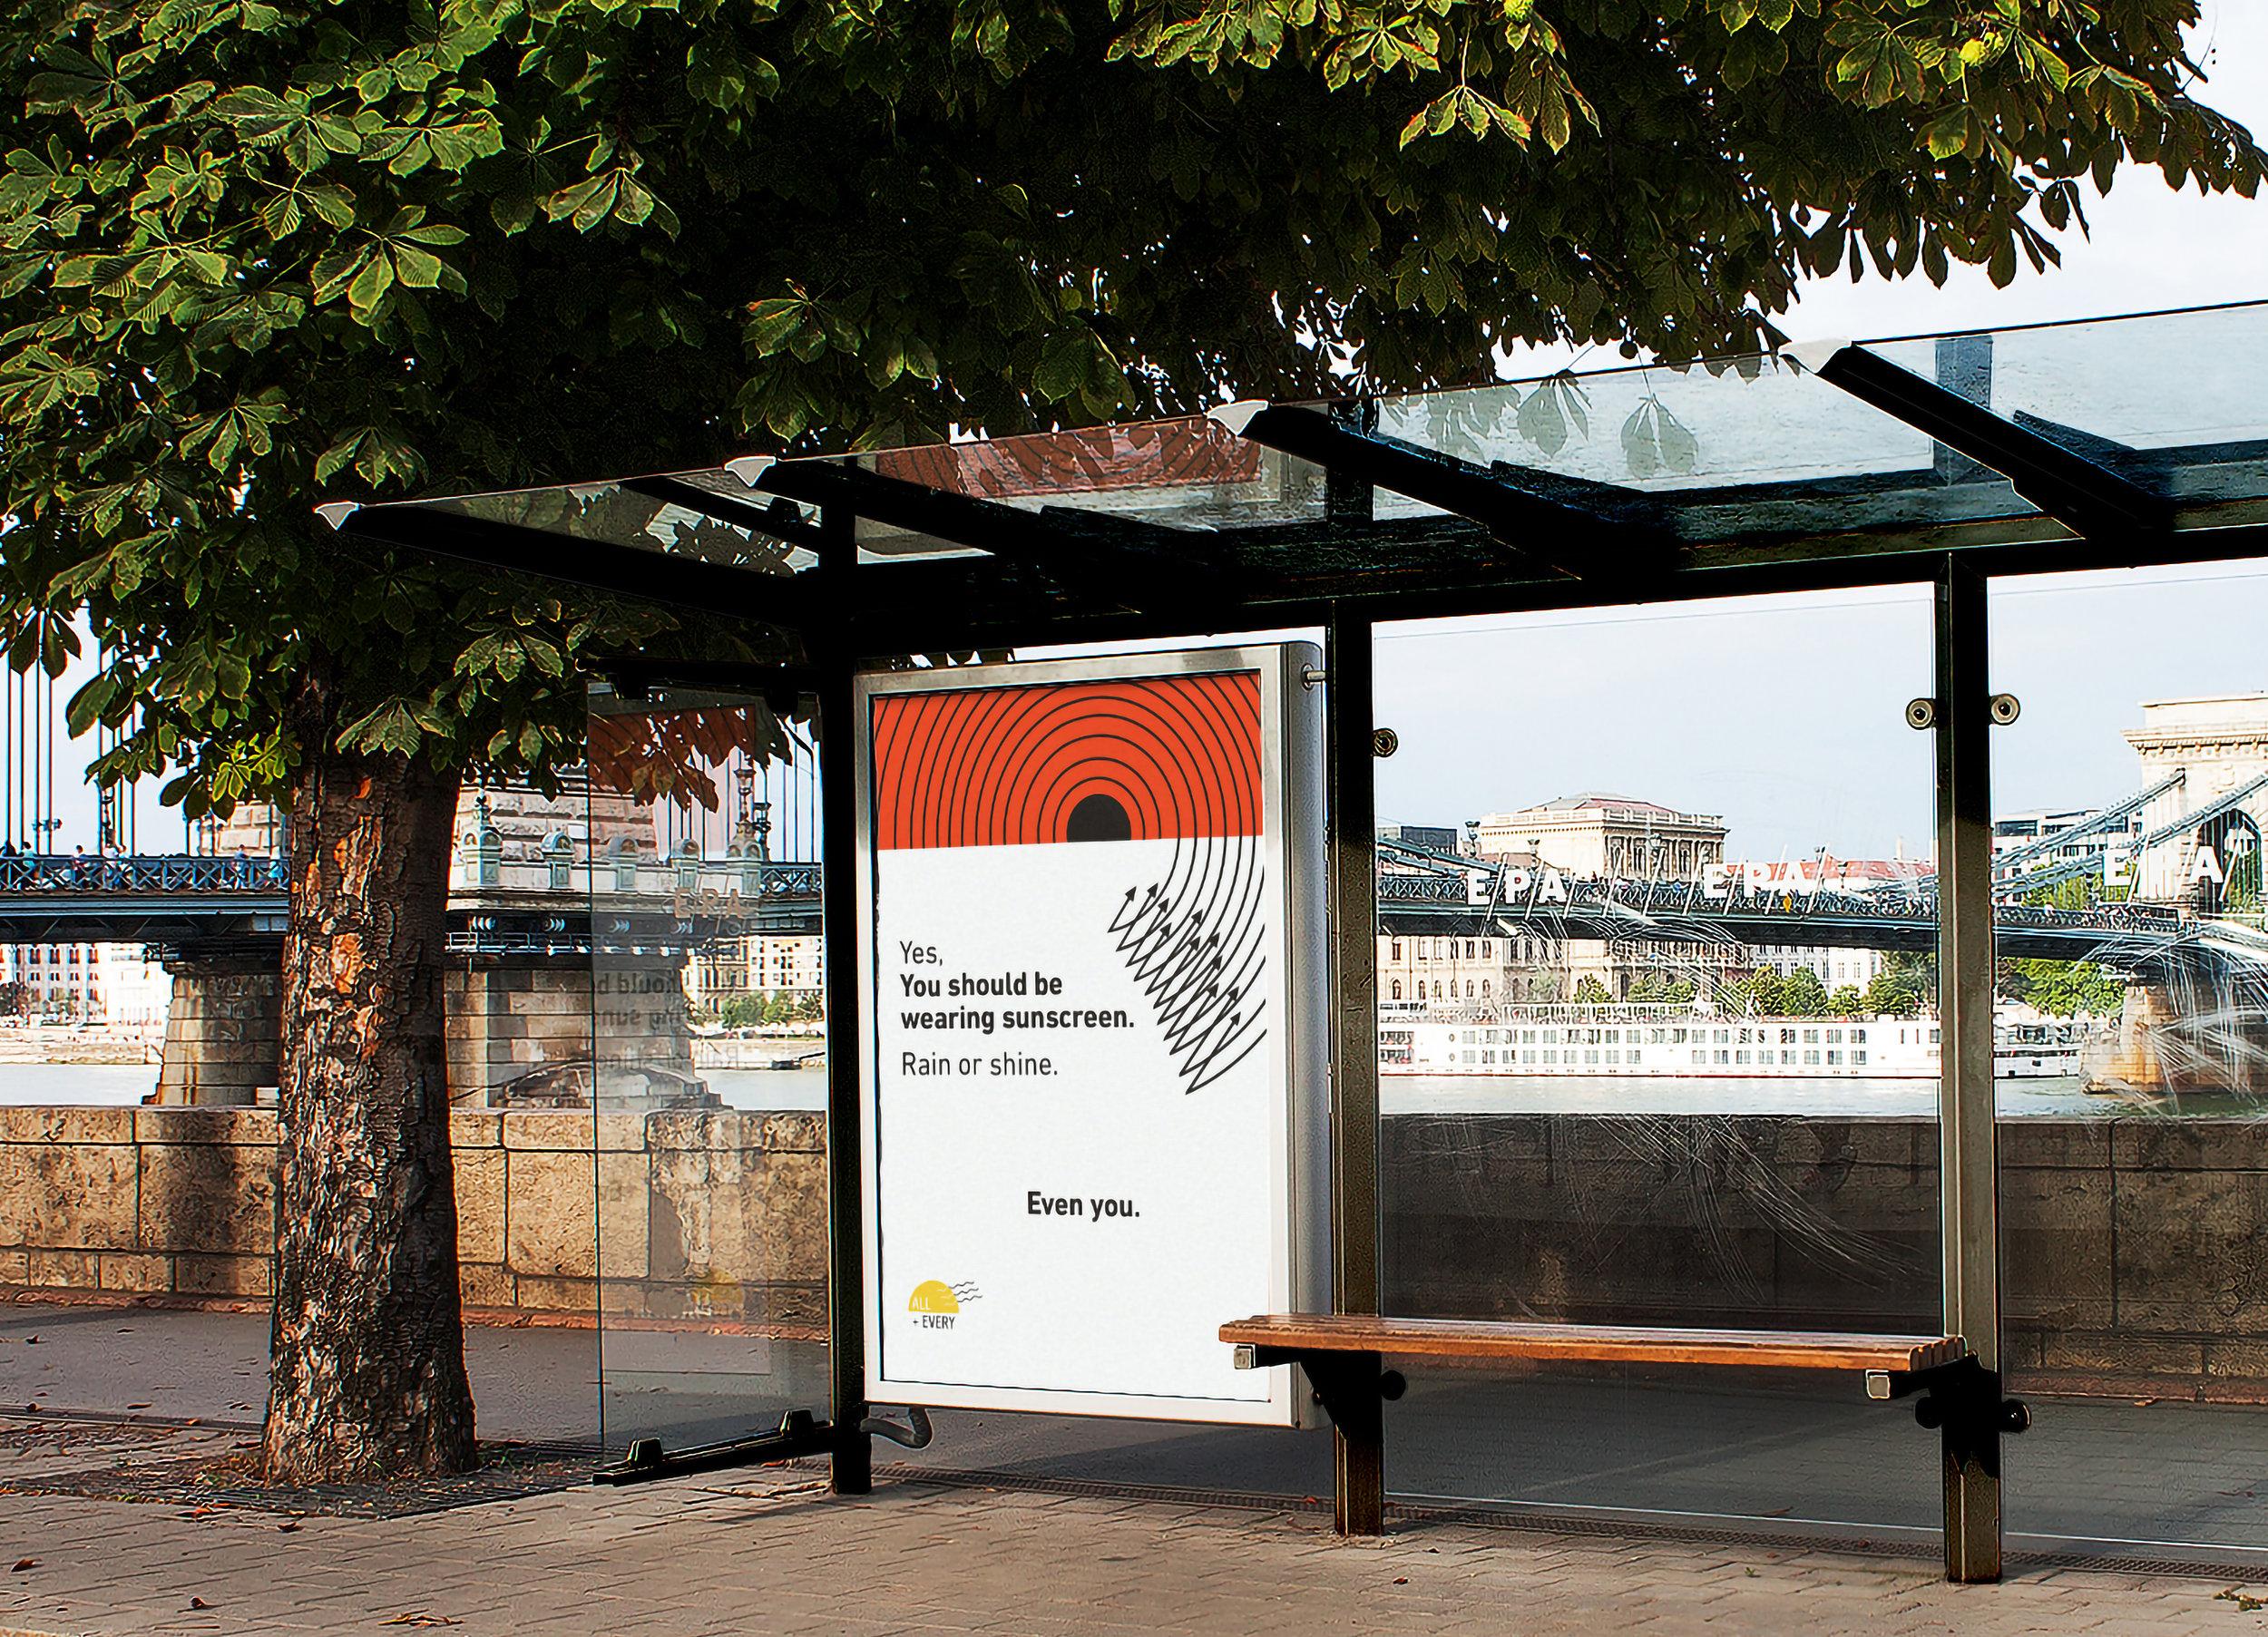 111_bus_station_urban_poster_mockup_red_crop.jpg